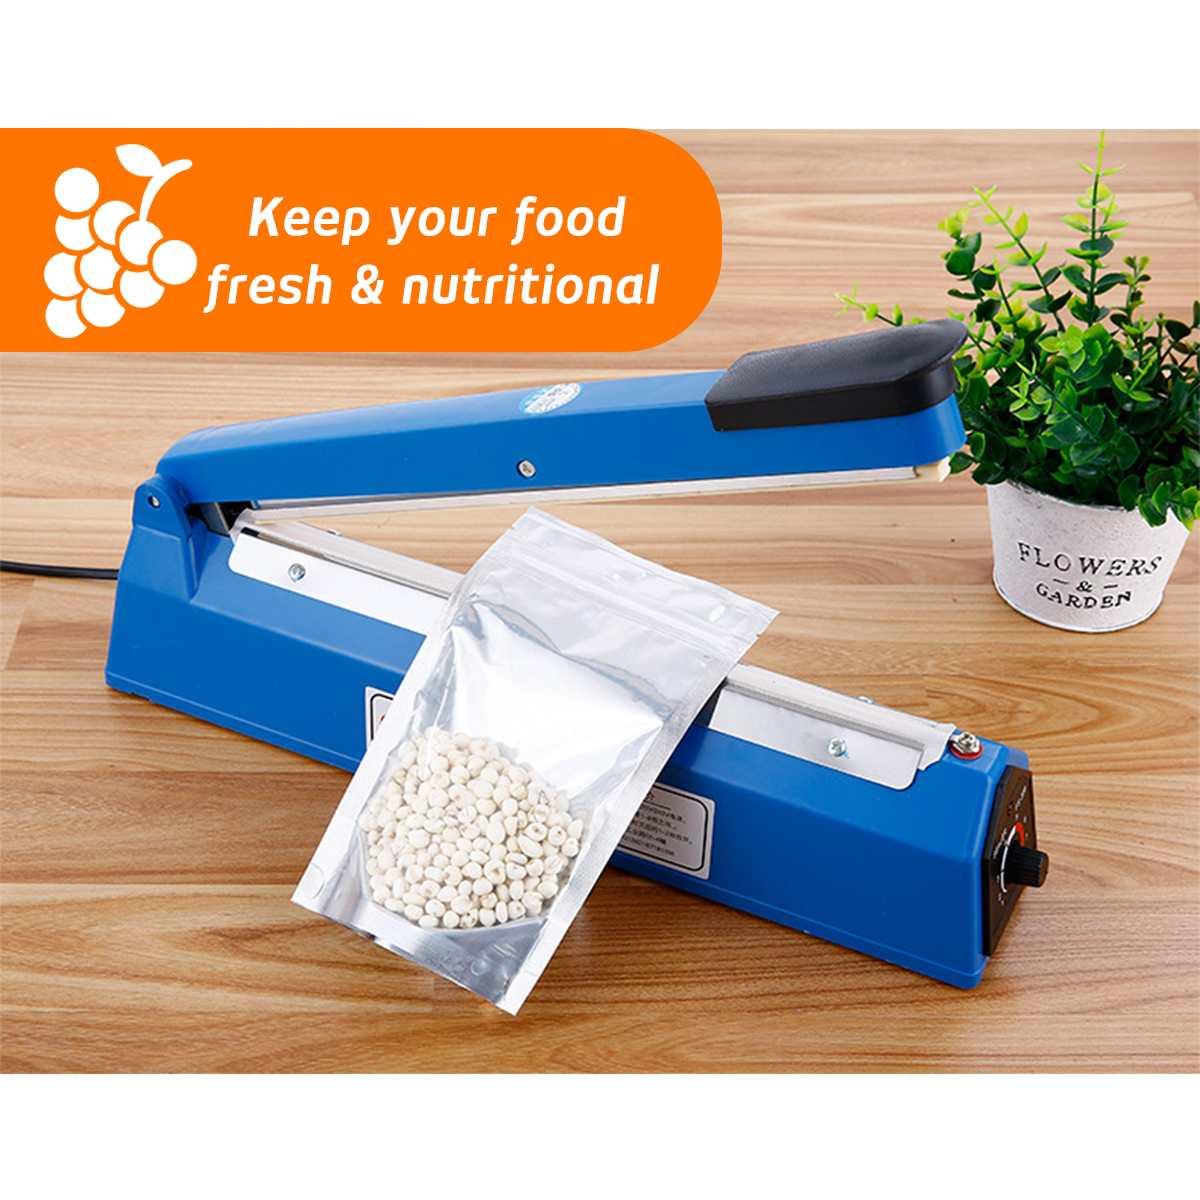 300W 220V Impulse Heat Sealer 8 Mode Plastic Bag Film Sealing Machine Metal 200mm